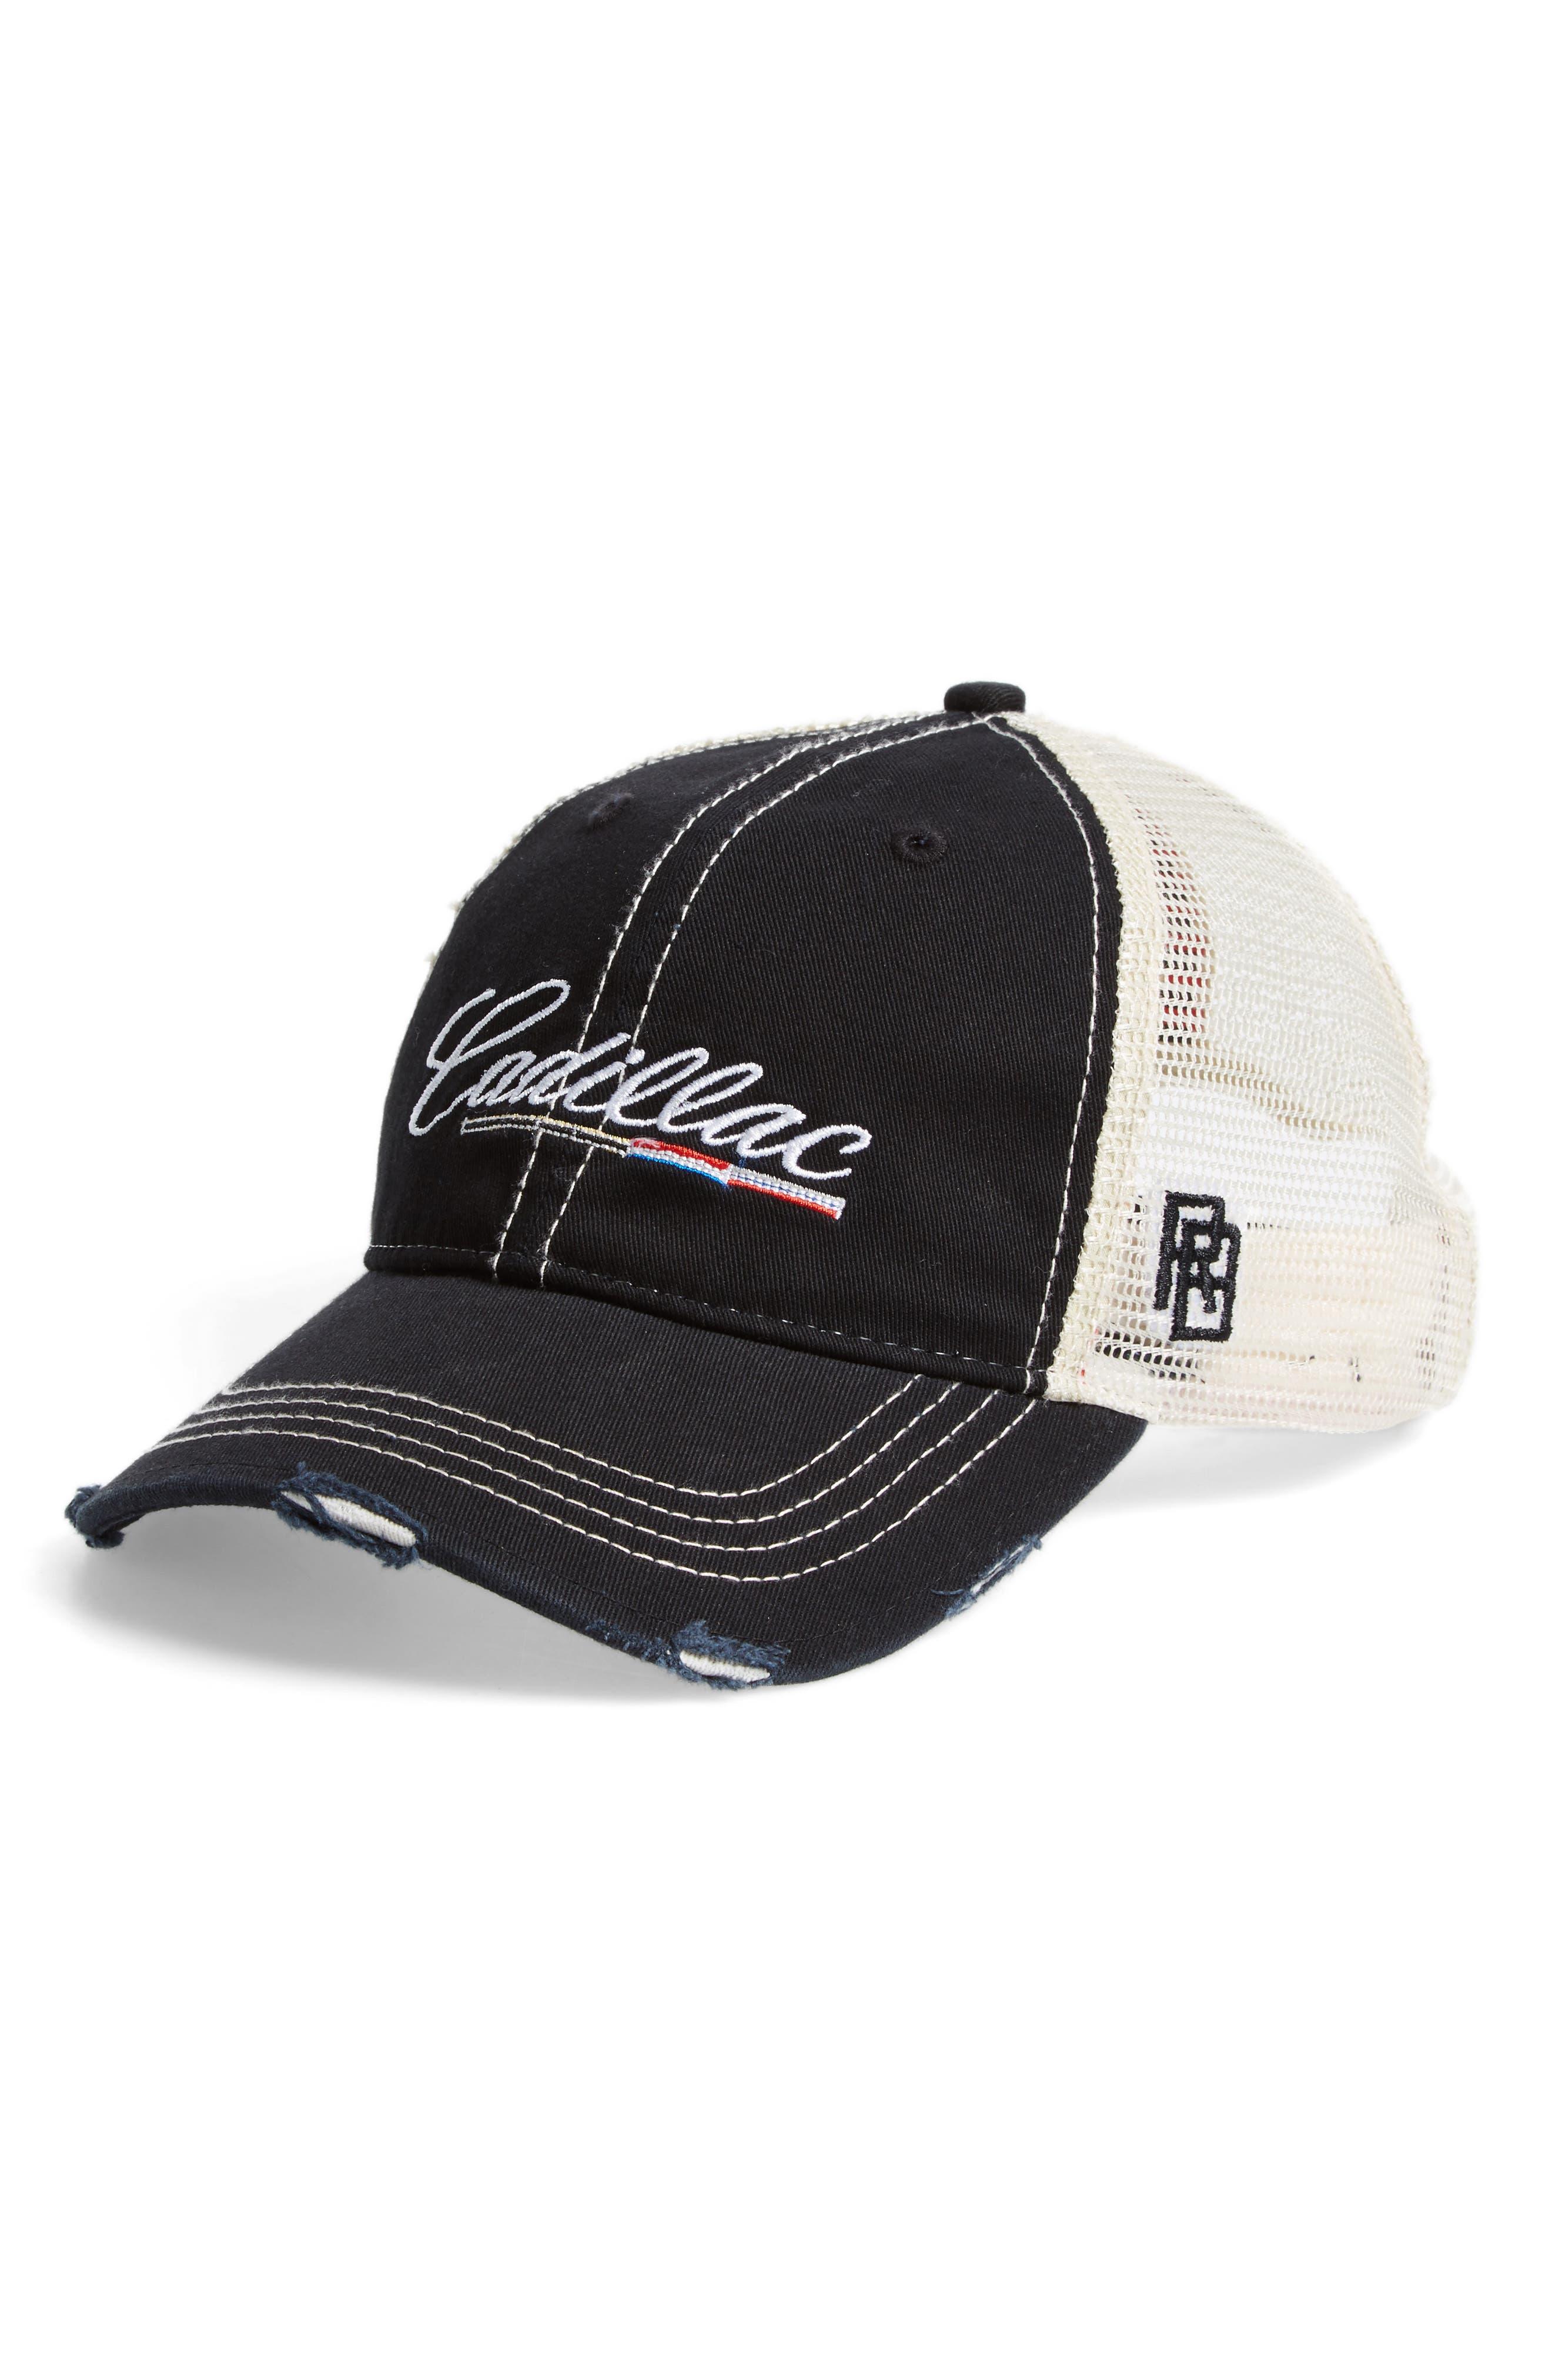 RETRO BRAND Original Retro Brand Cadillac Trucker Hat